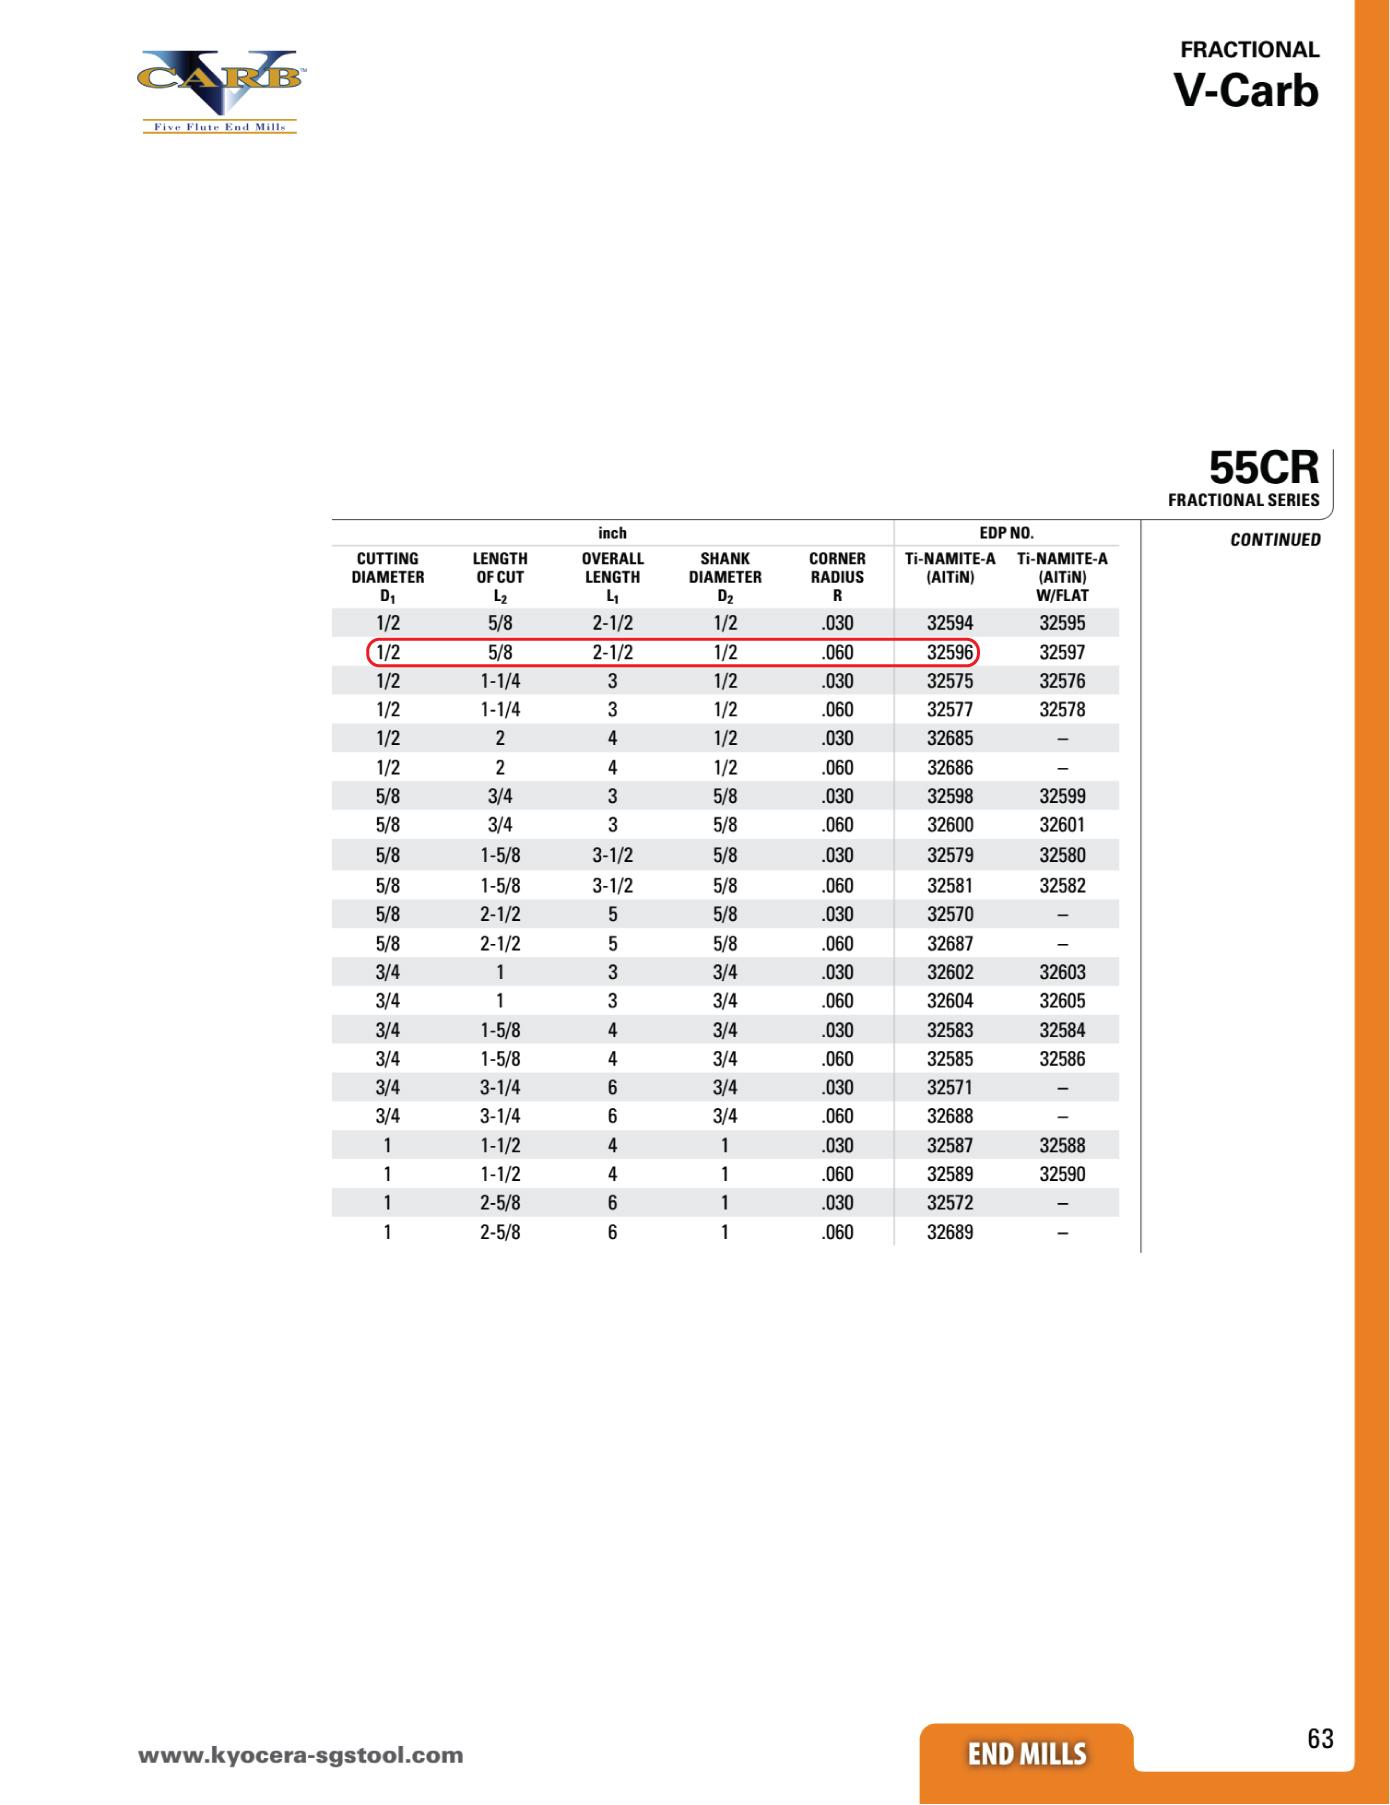 DAO PHAY BO GÓC 5F PHI 1/2 INCH KYOCERA SGS V-CARB KSP32596